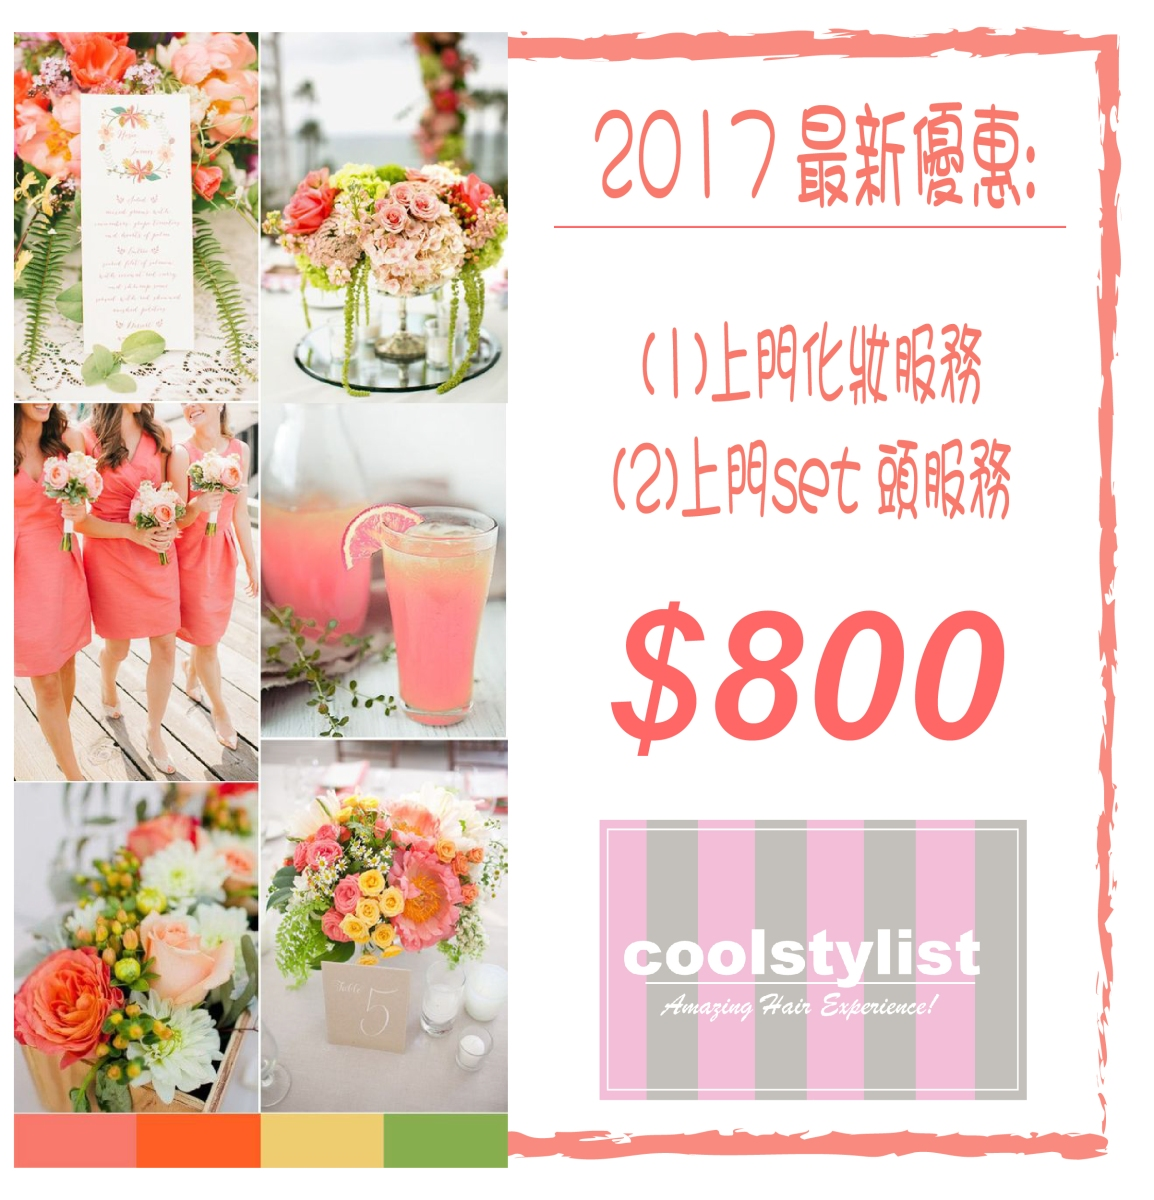 Coolstylist 上門化妝set頭2017最新優惠:🎈